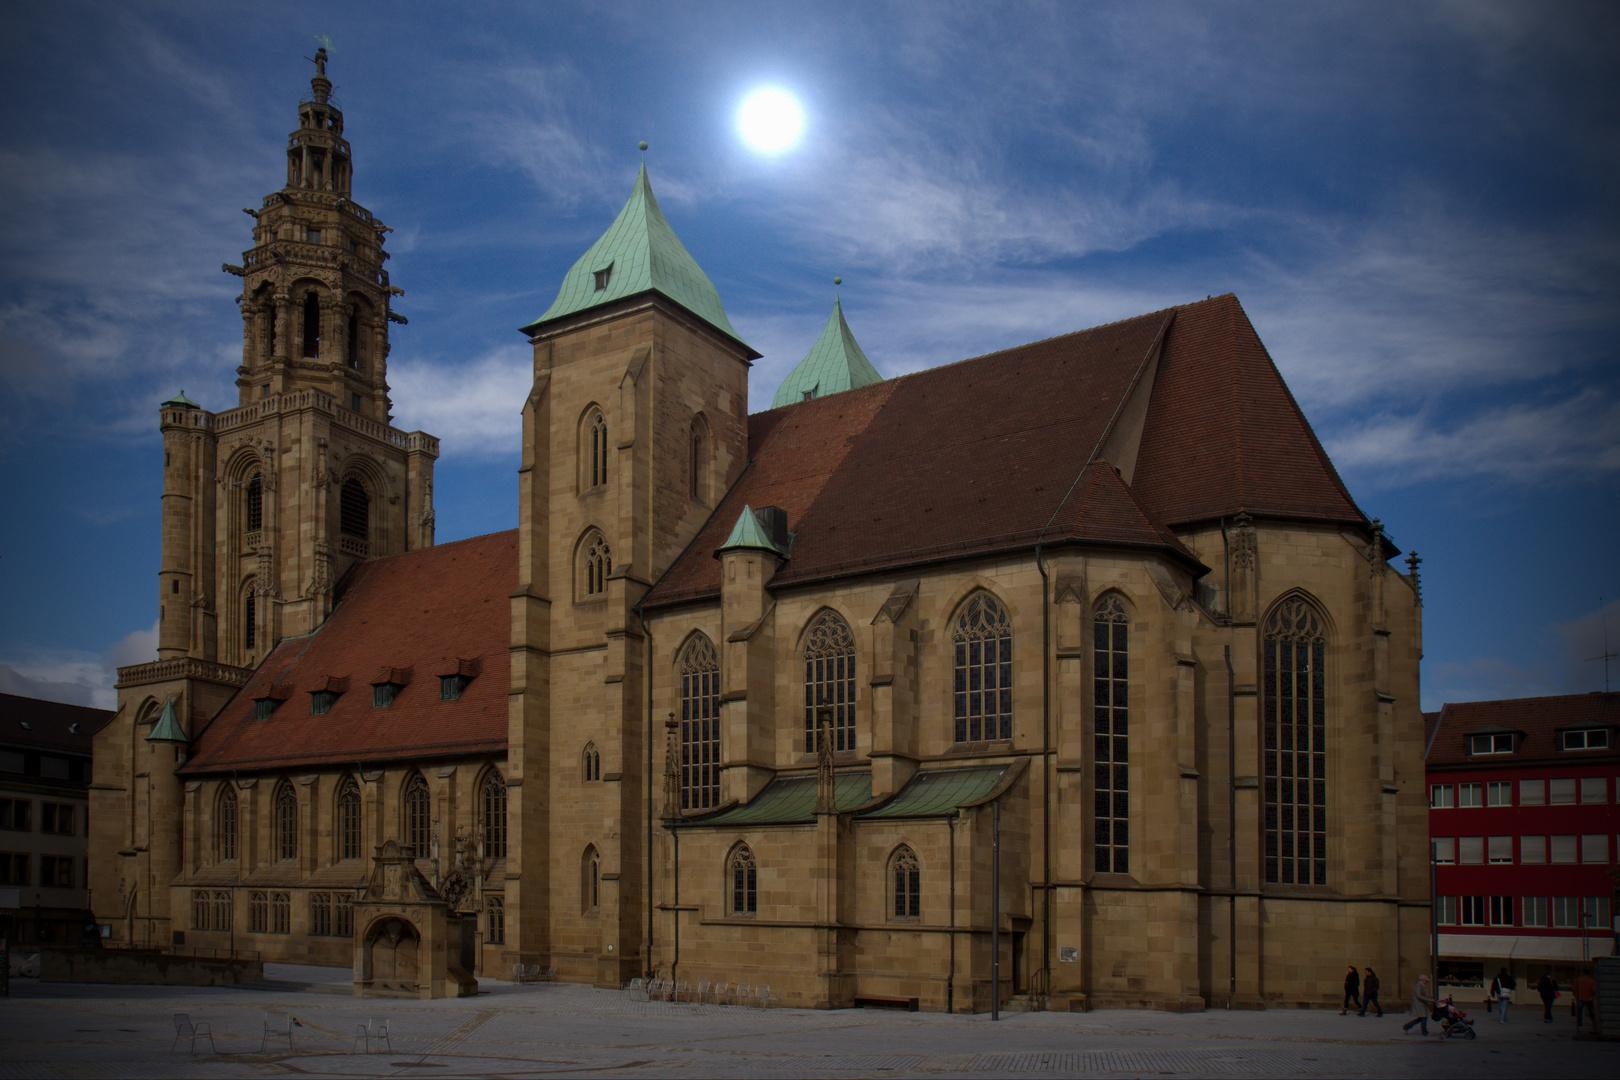 Kilianskirche Heilbronn im Herbstlicht